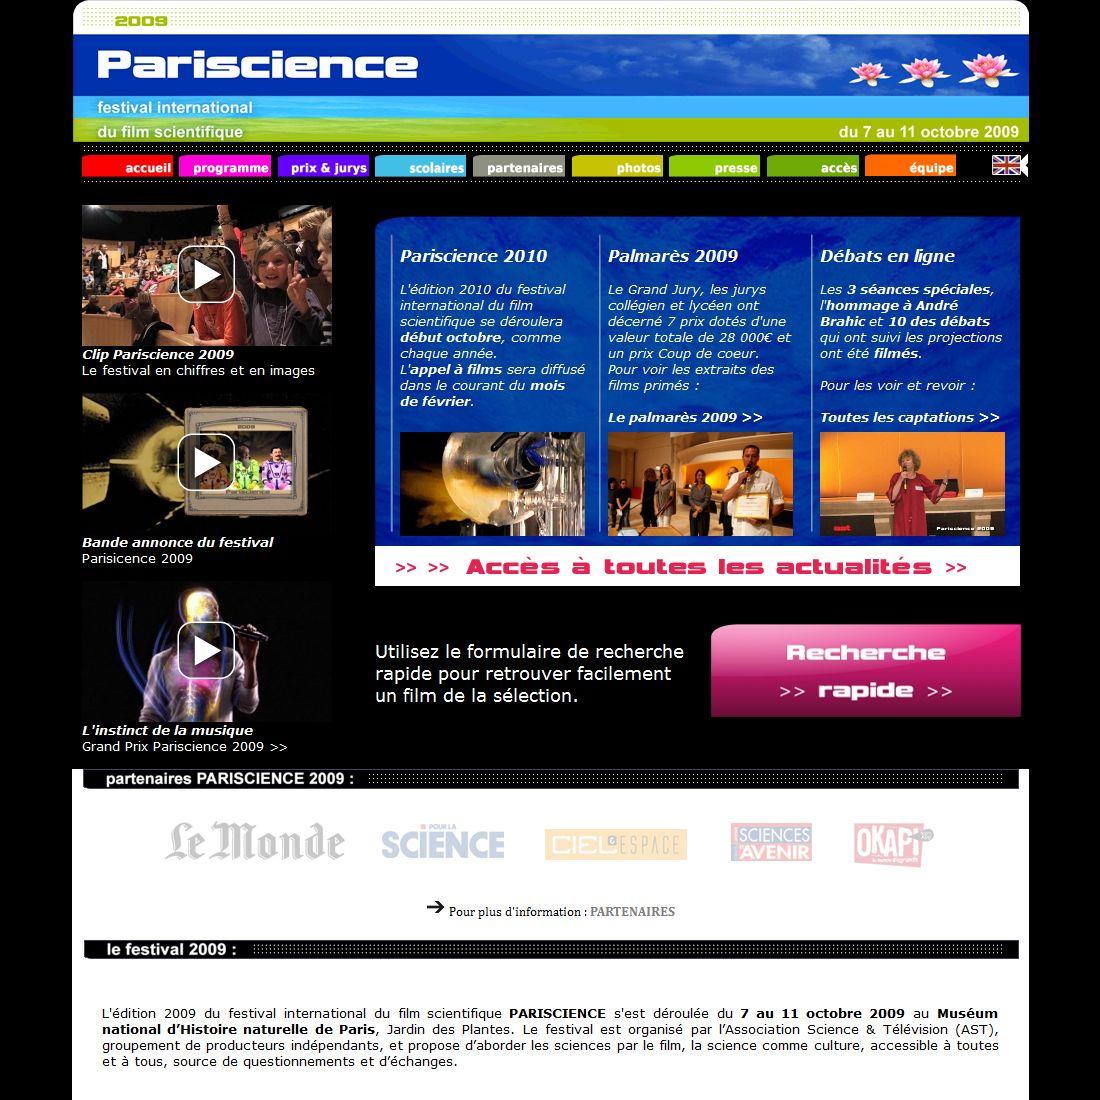 www.pariscience.fr